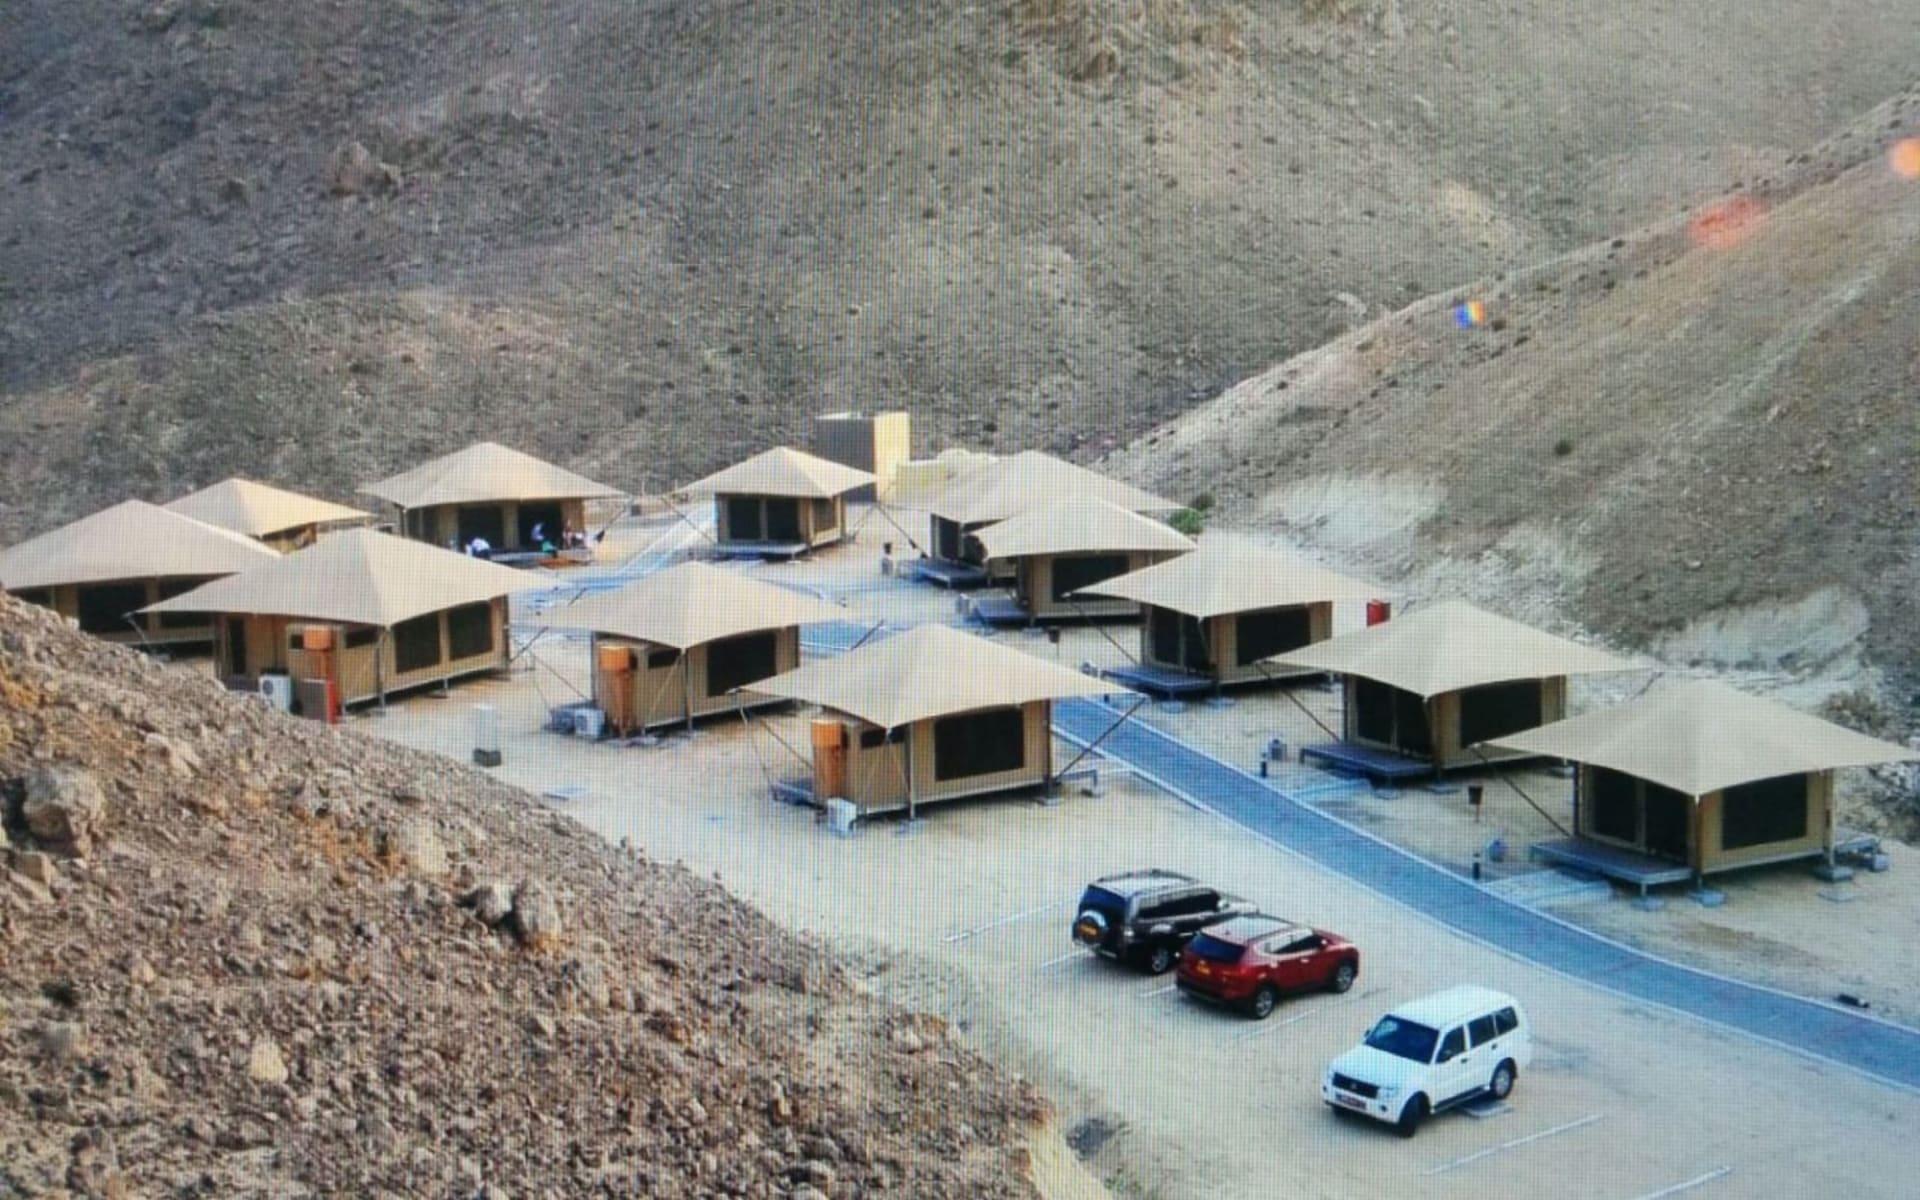 Ras al Jinz Scientific & Visitor Center in Sur: